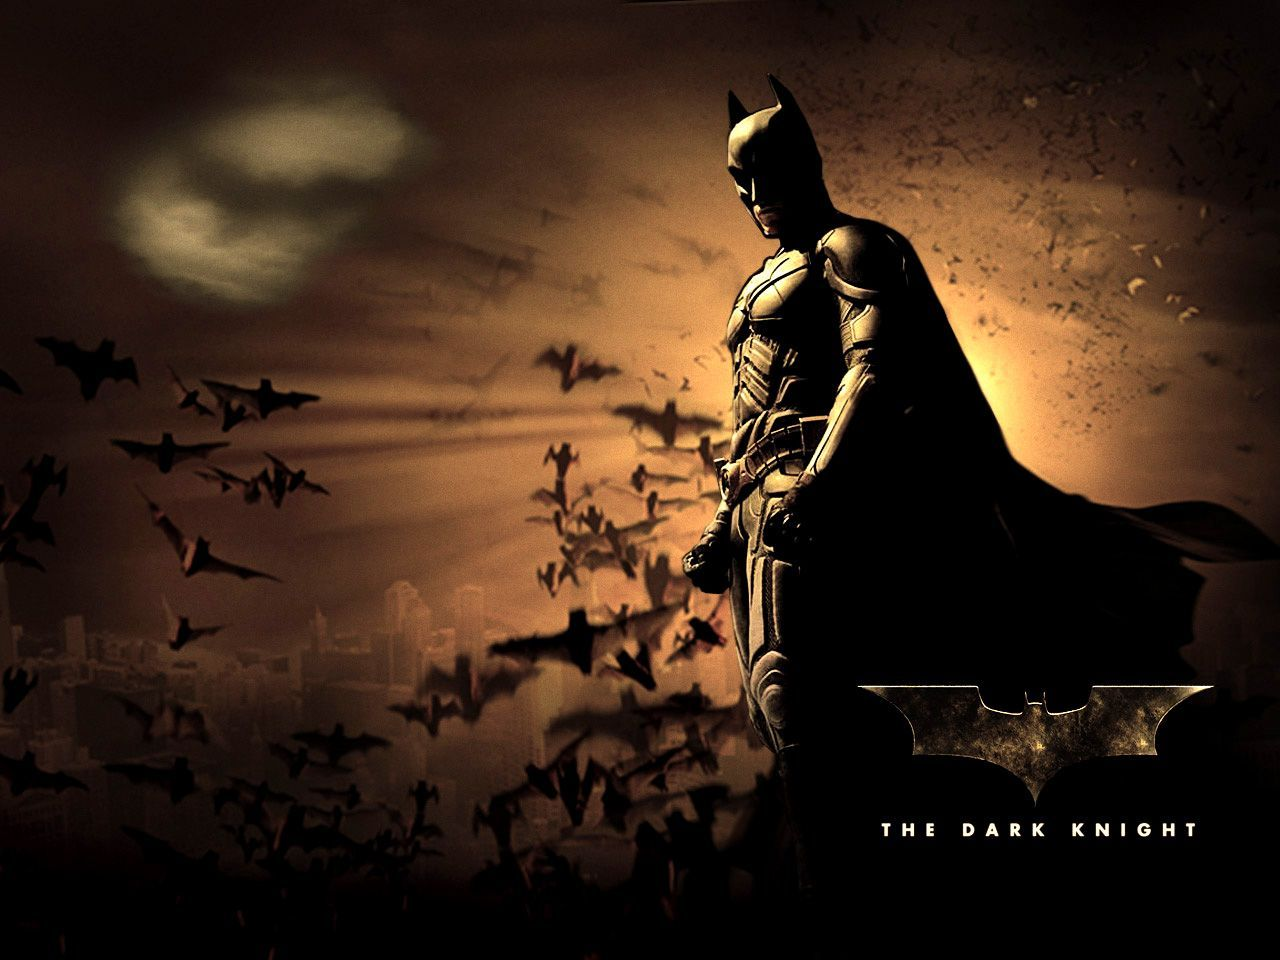 batman hd wallpapers for desktop - sf wallpaper